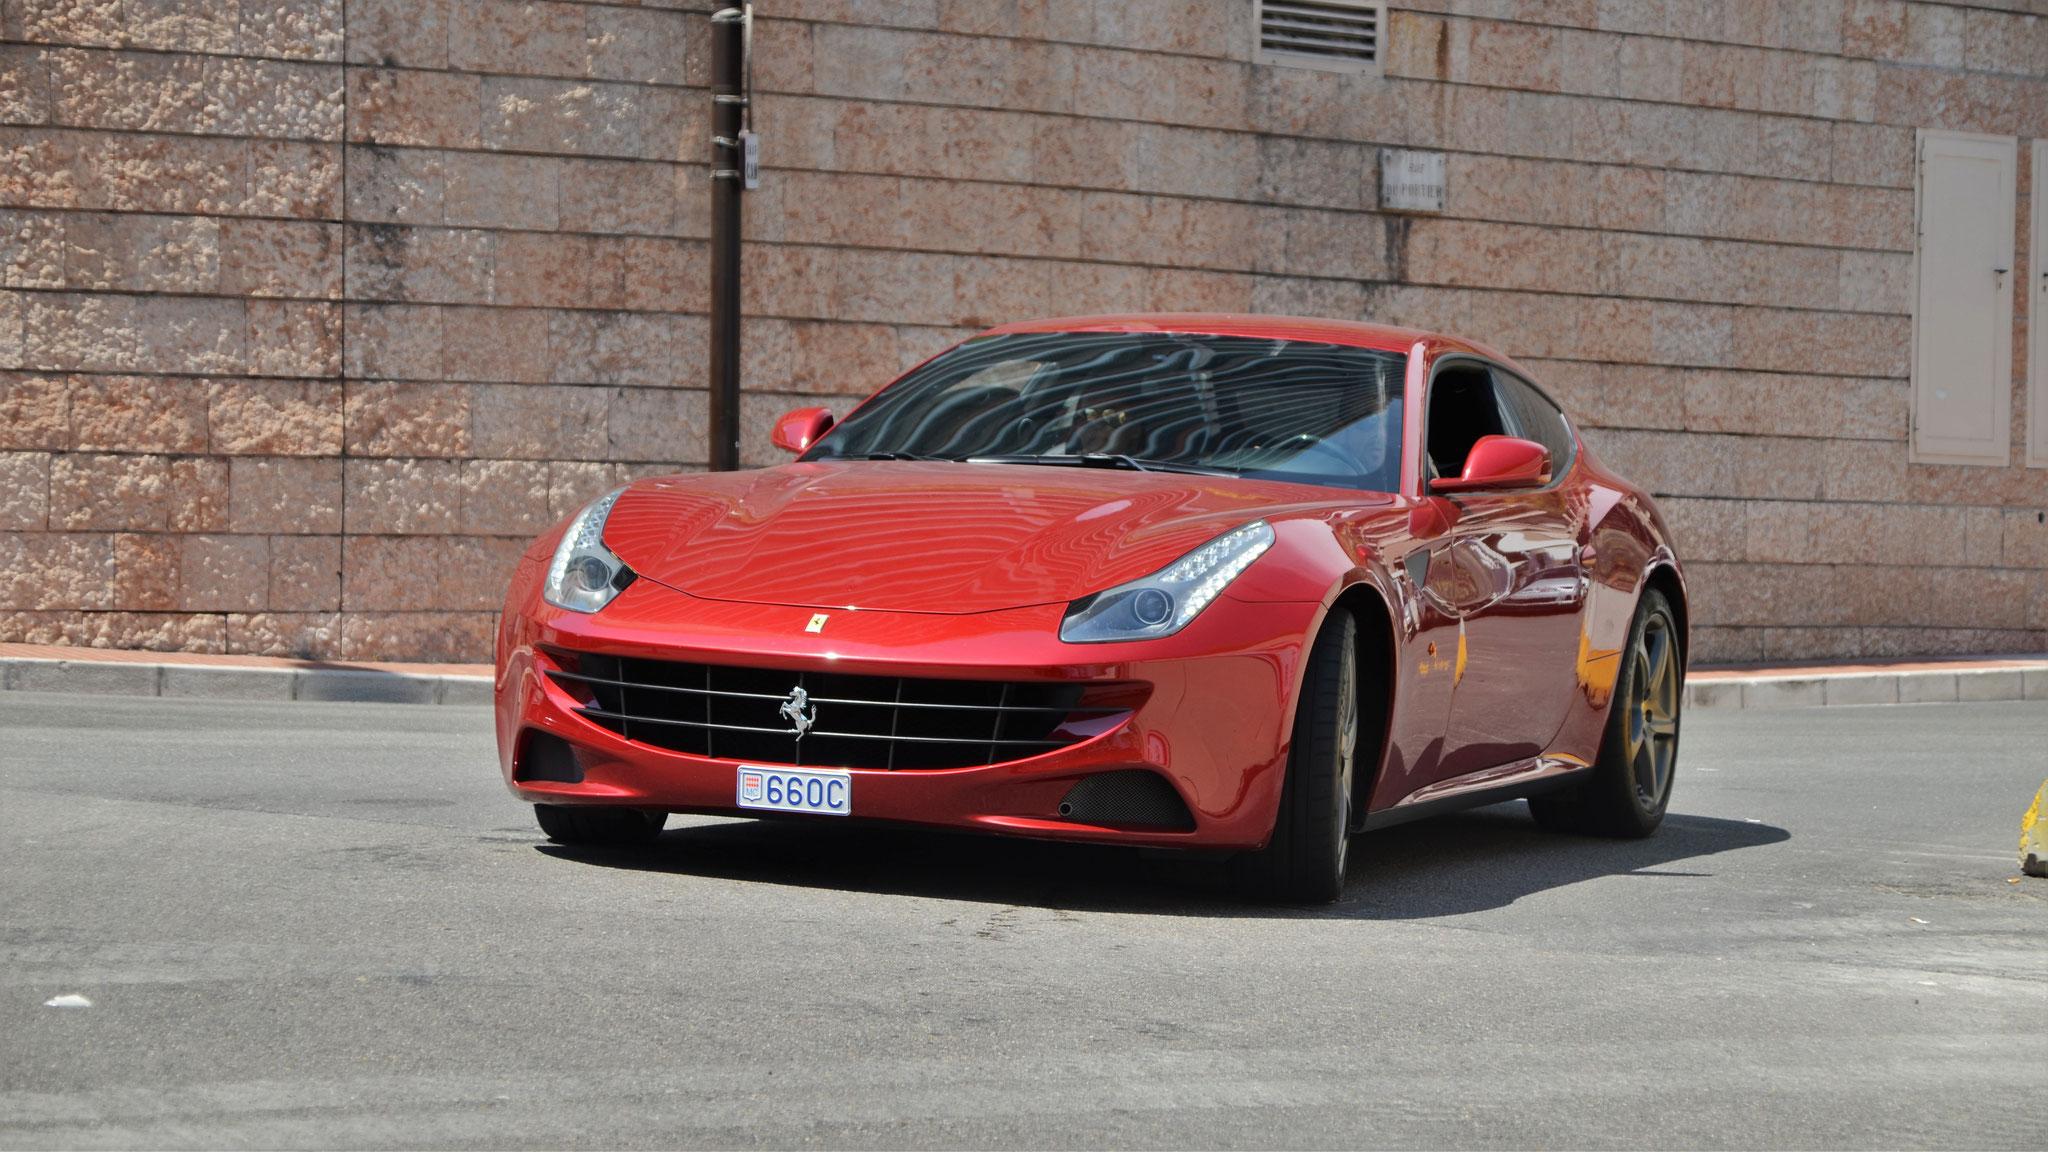 Ferrari FF - 660C (MC)